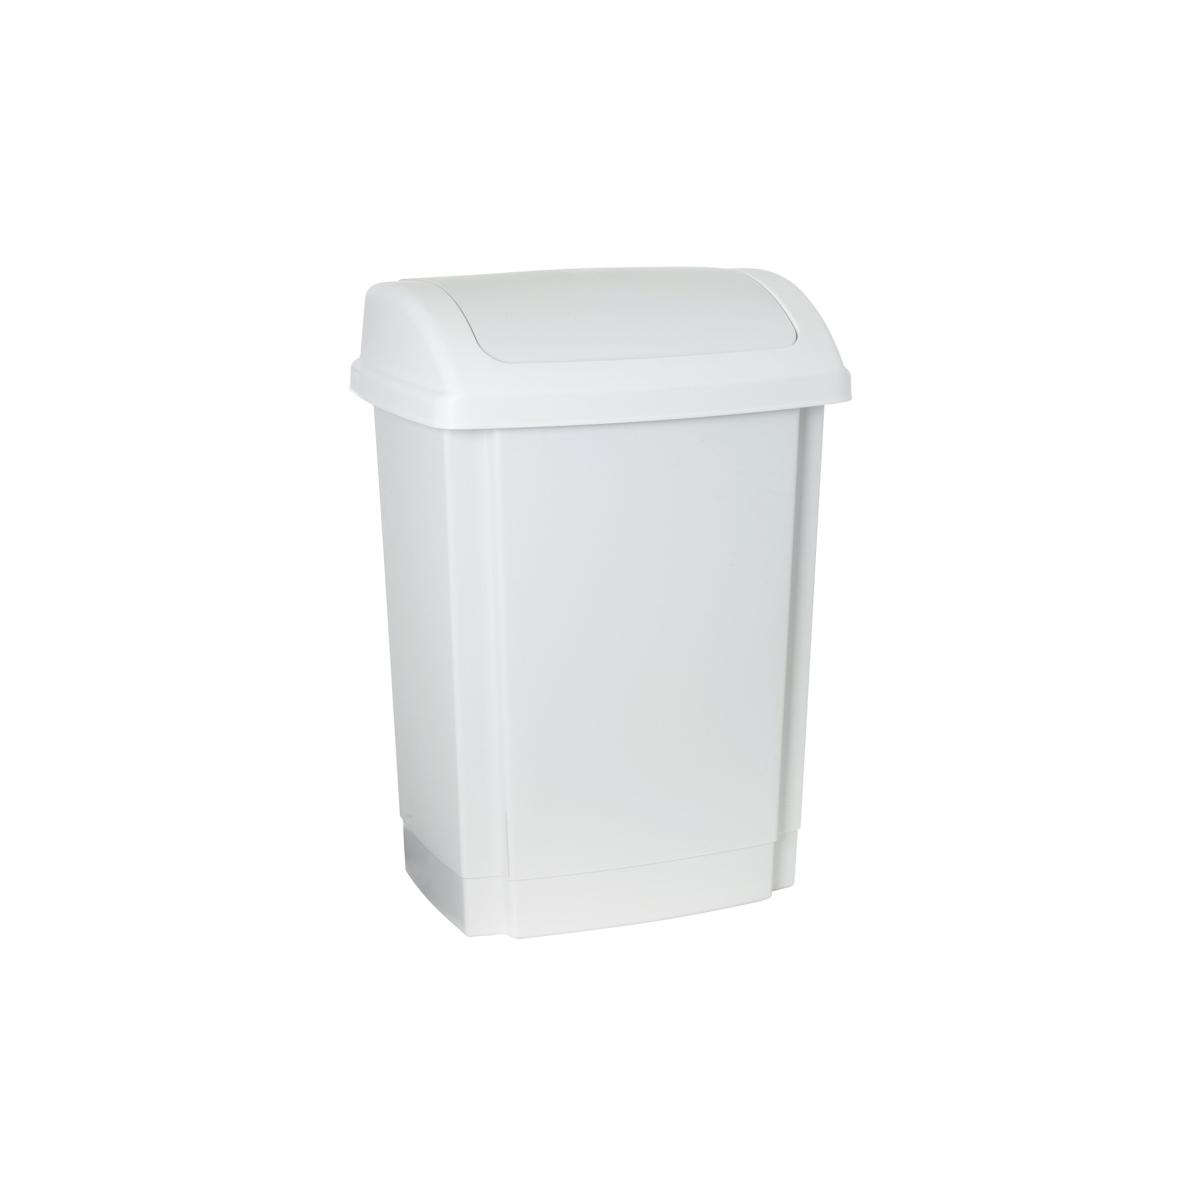 09f5ac47ac3af1 Plast Team, Kosz na śmieci SWING 10L